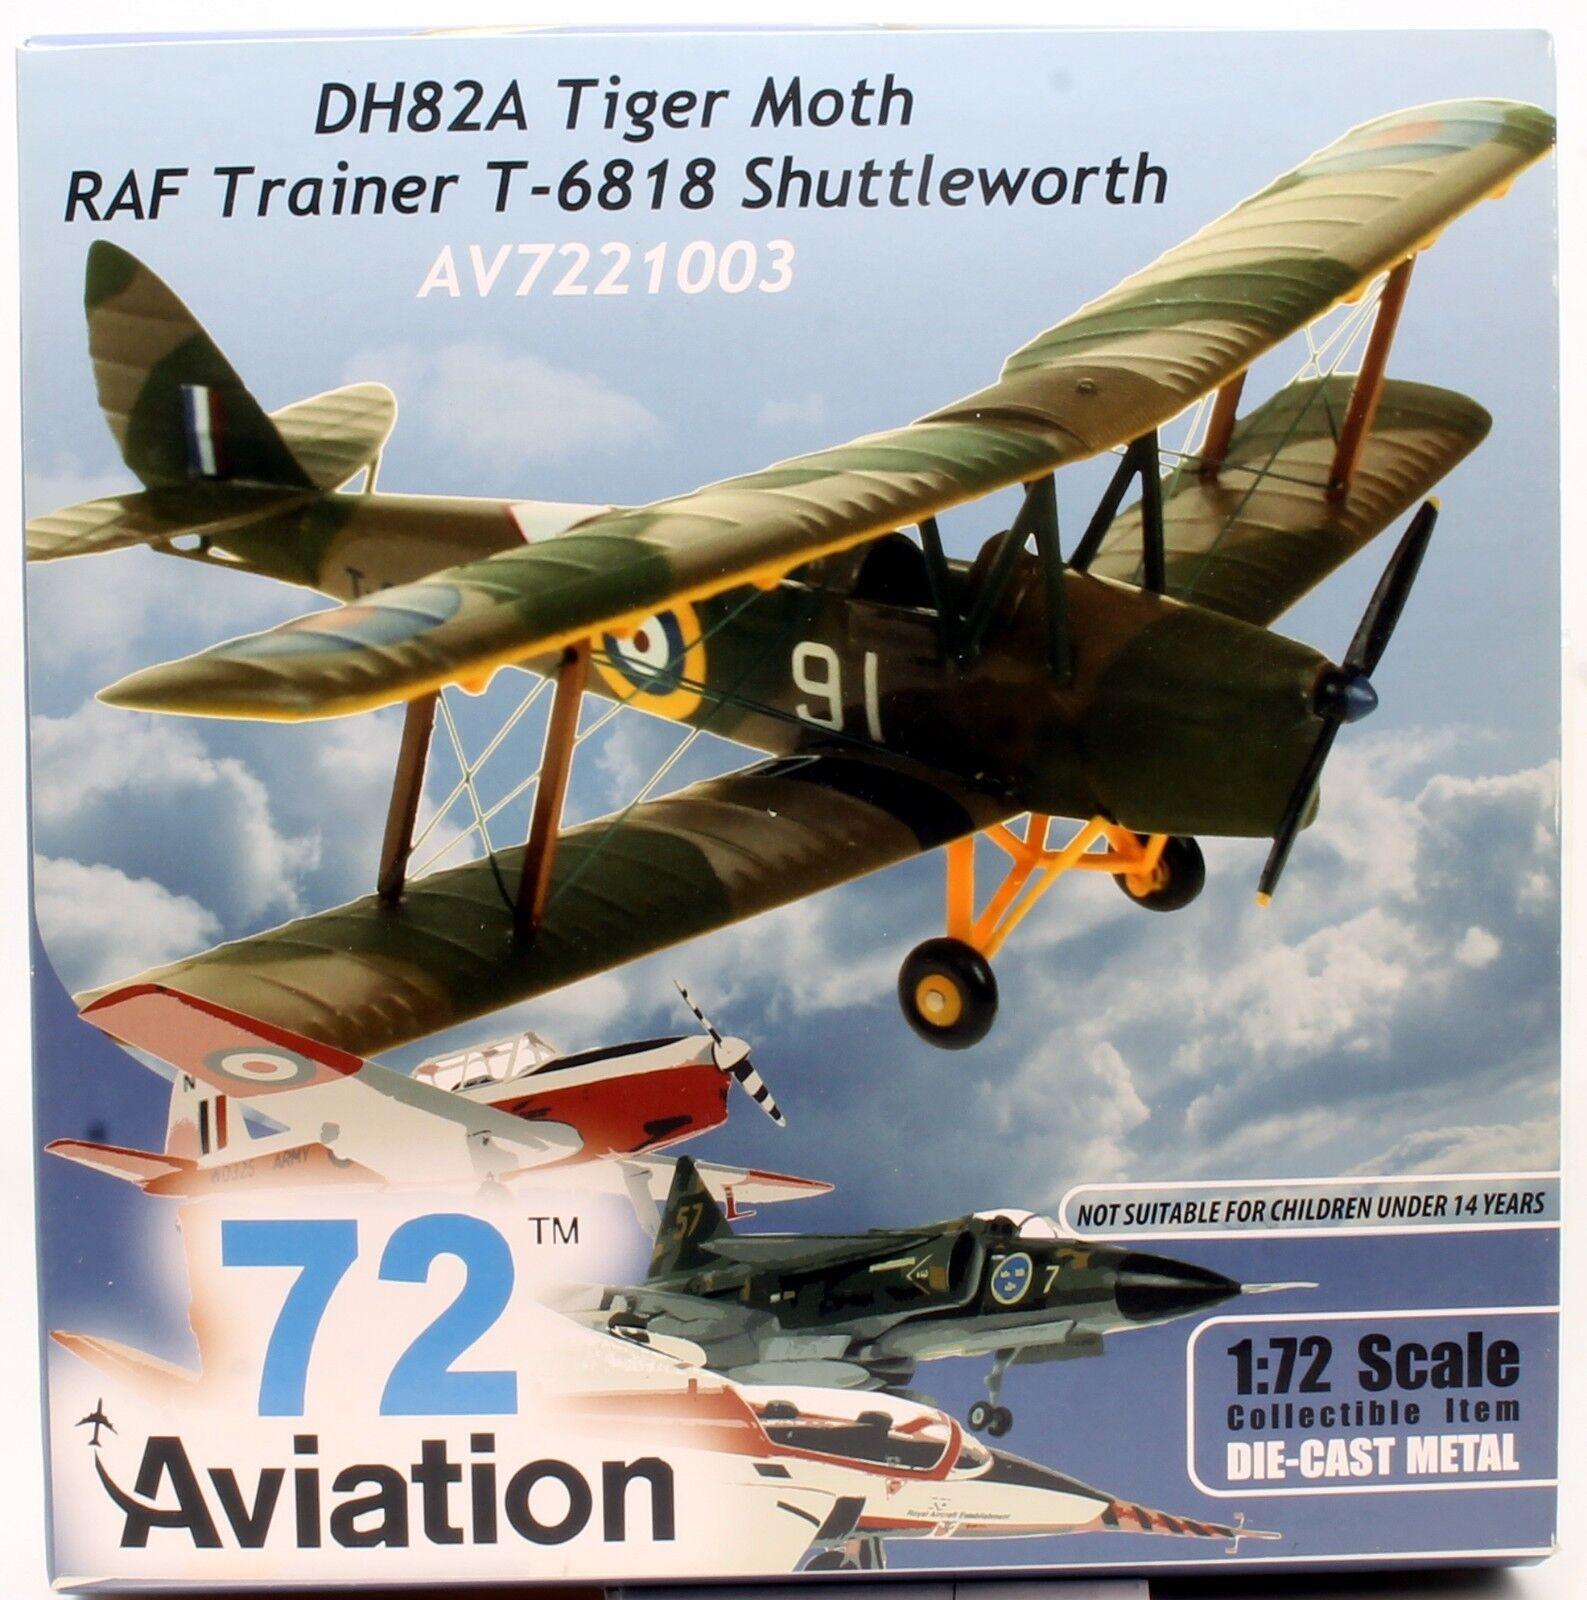 AVIATION 72 1 72 AV-72-21-003 ROYAL AIR FORCE DH82A TIGER MOTH T-6818 (U21)